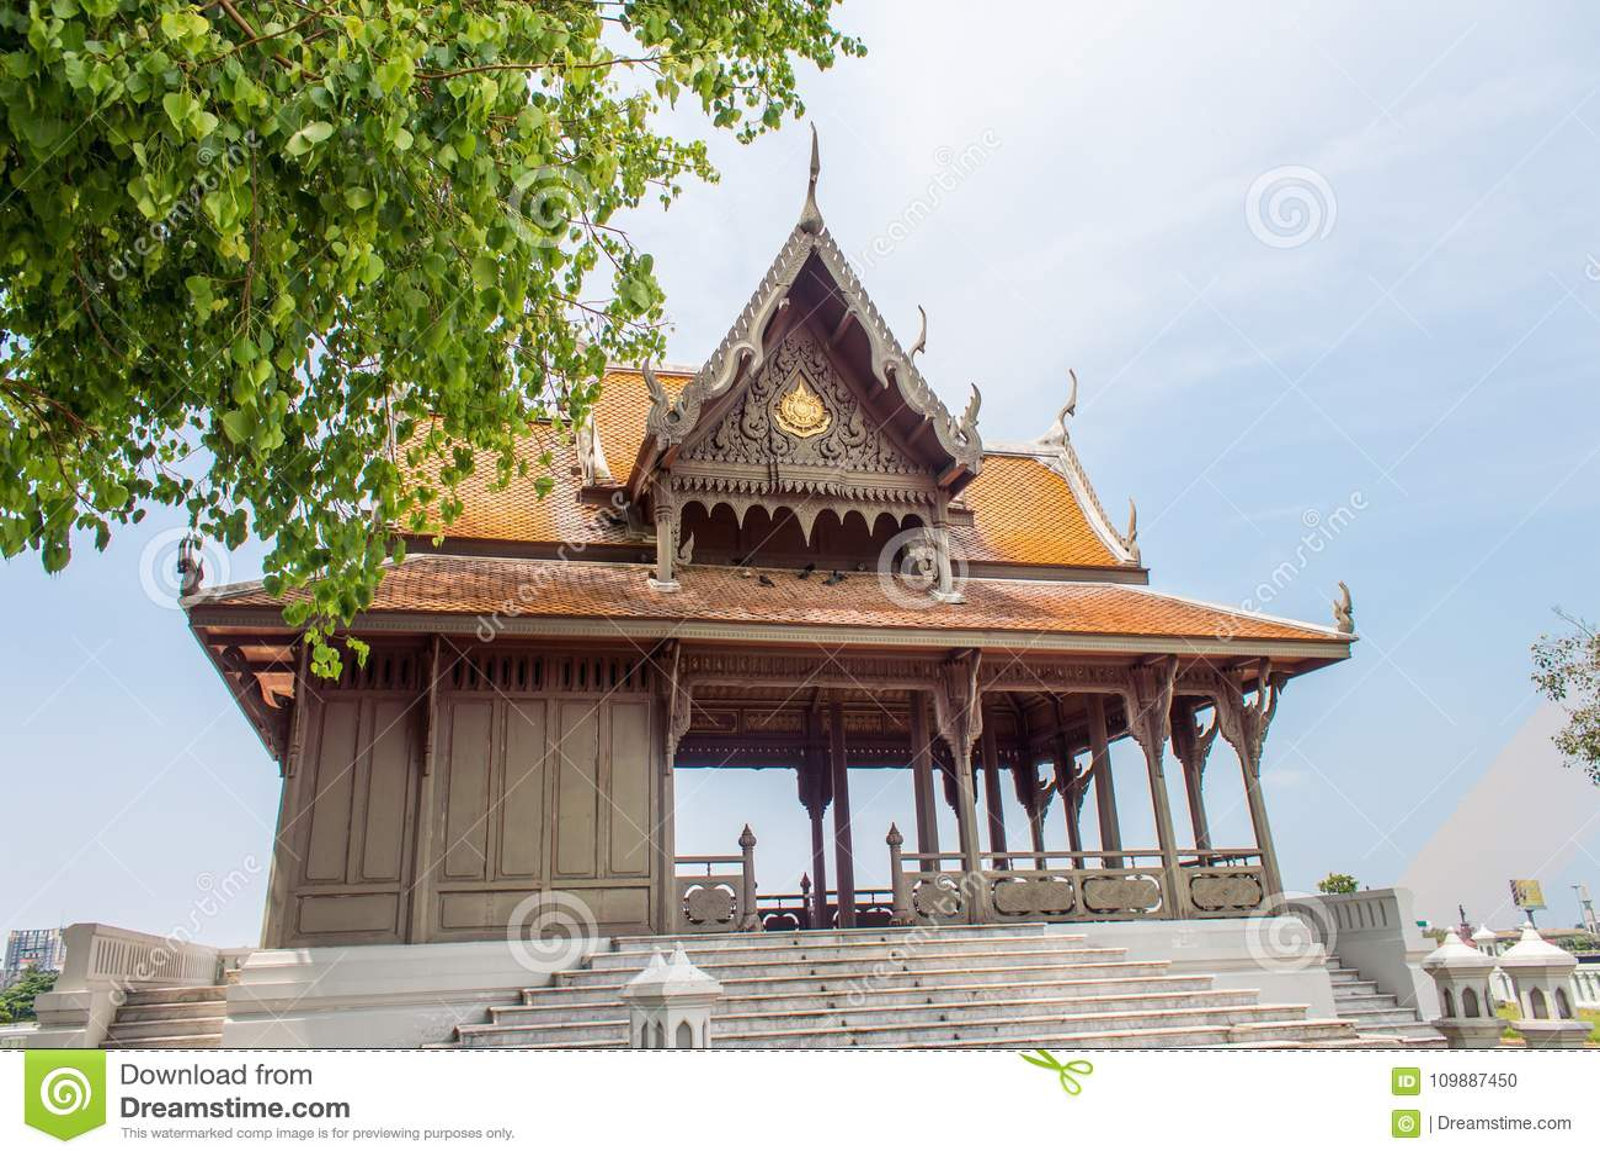 Pavillion Santi Chai Prakan в парке Santi Chai Prakan в Бангкоке, Таиланде